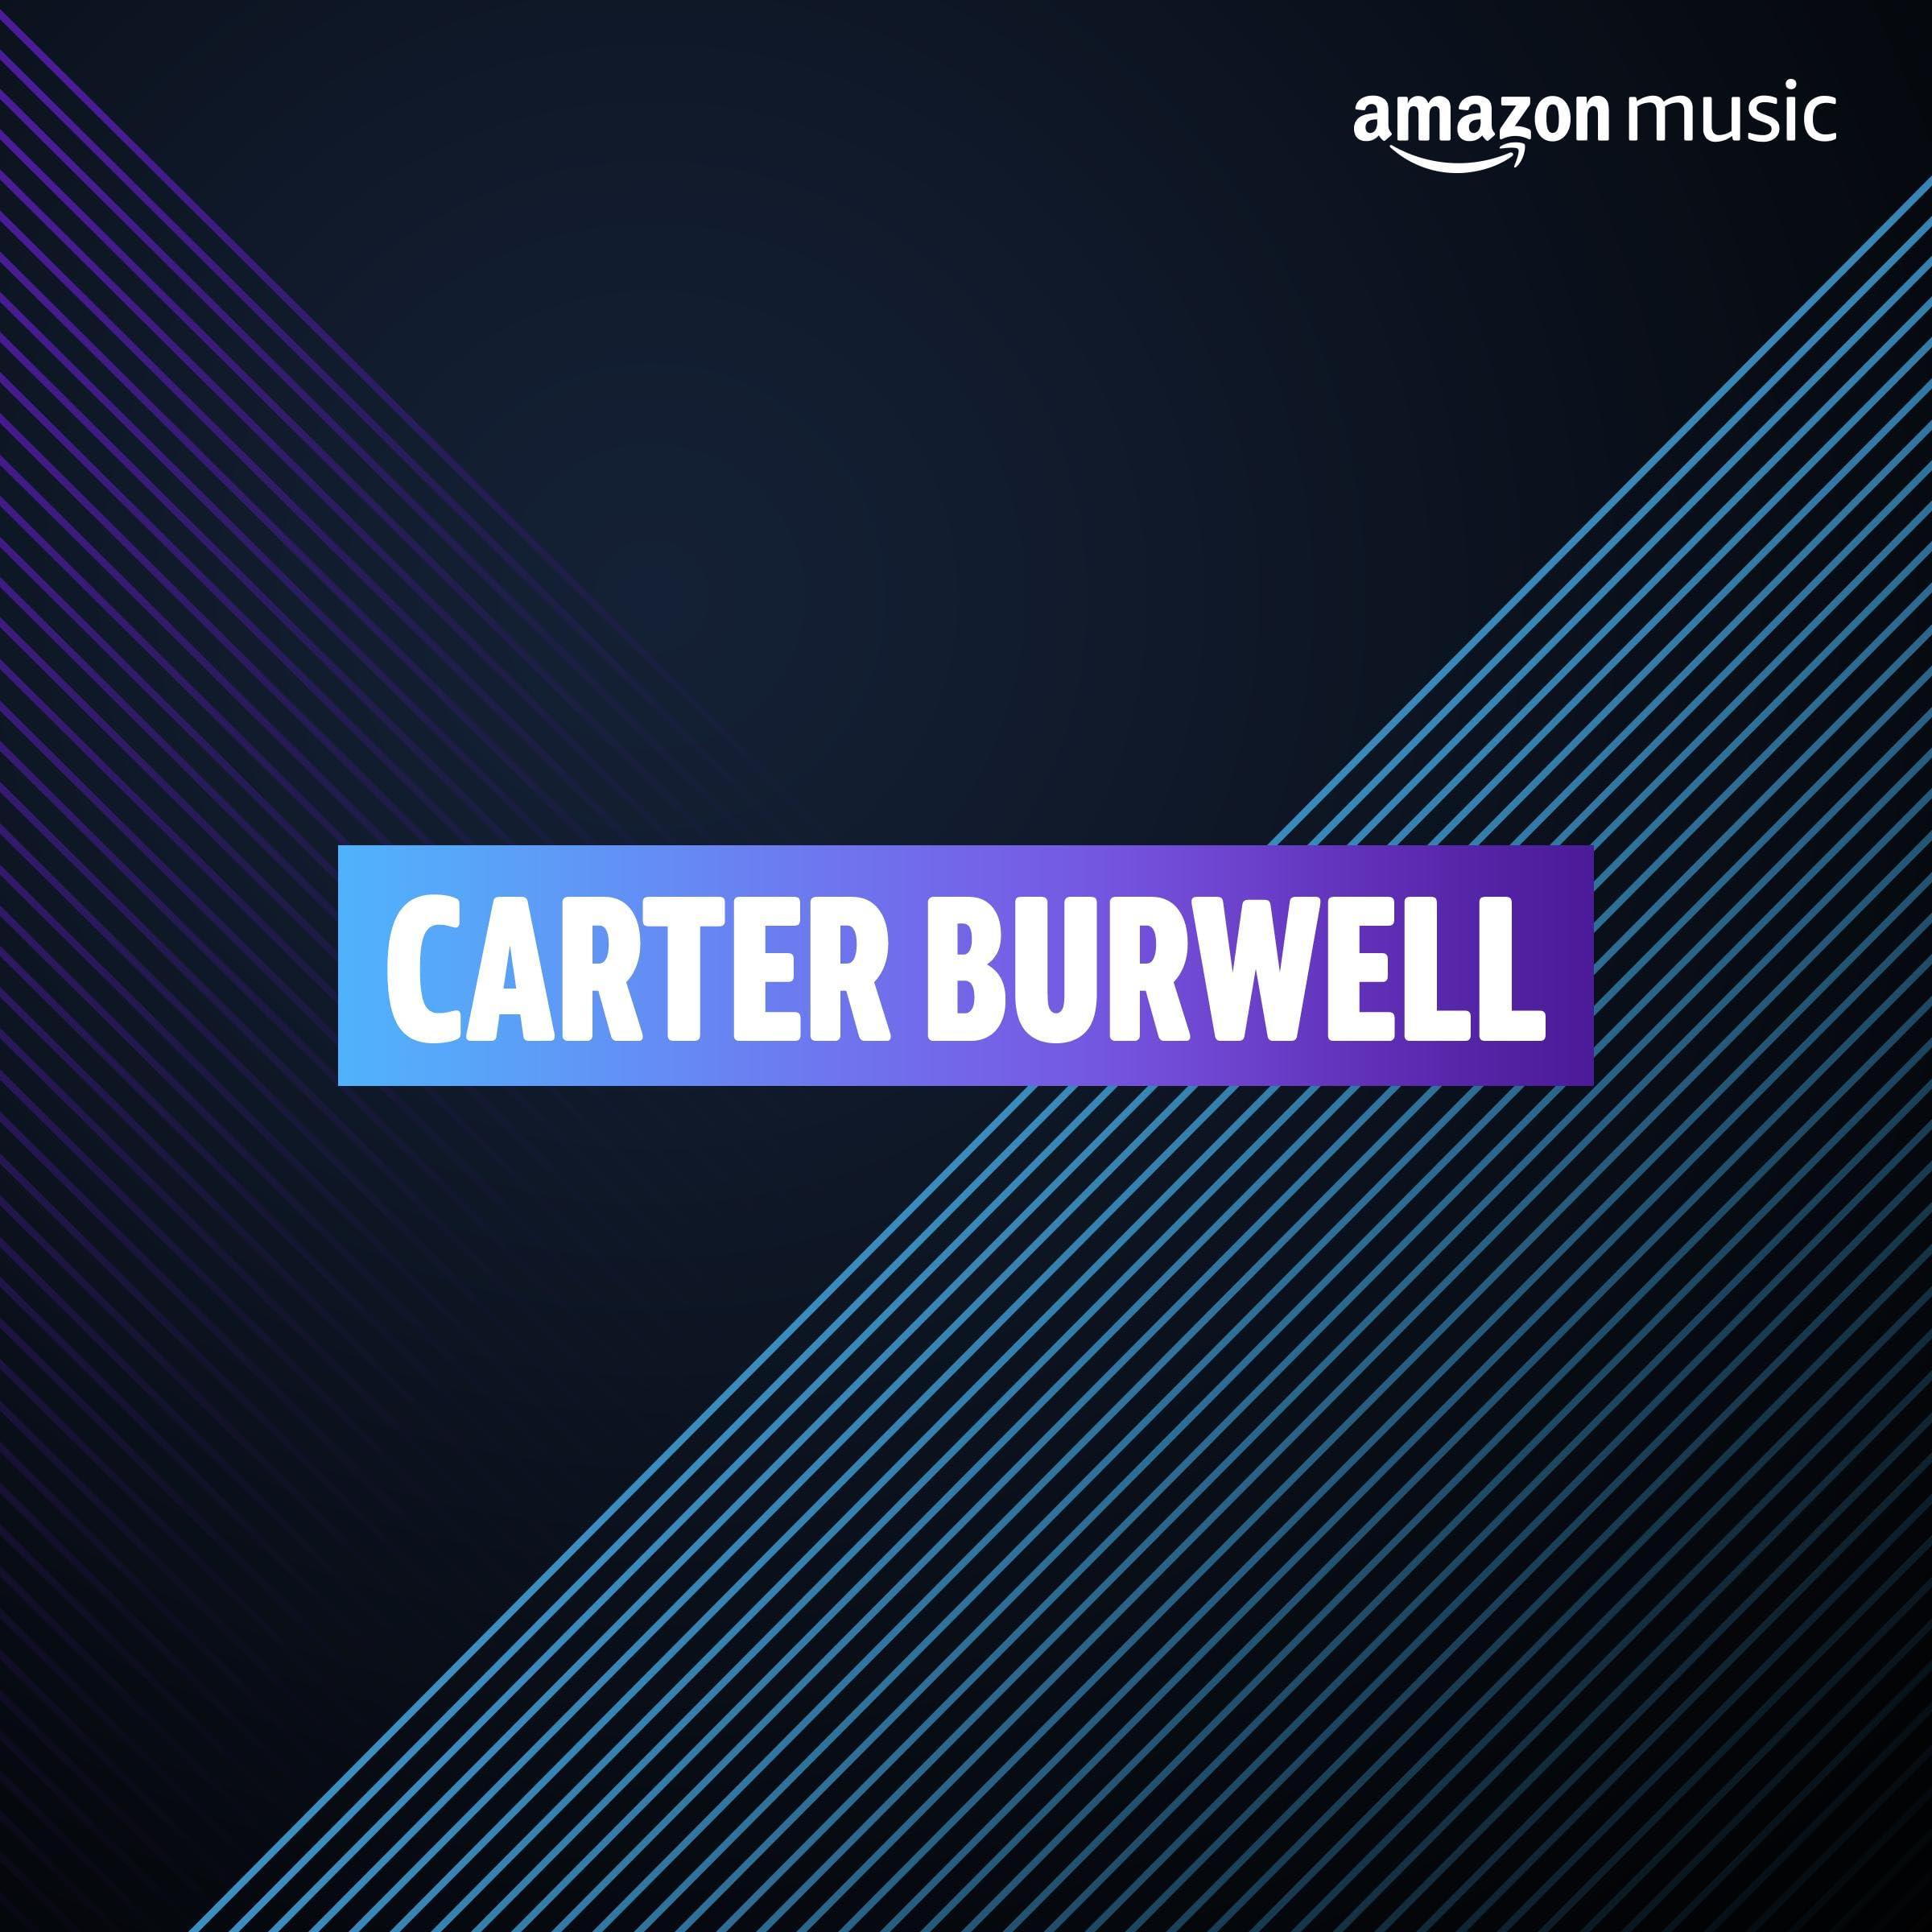 Carter Burwell